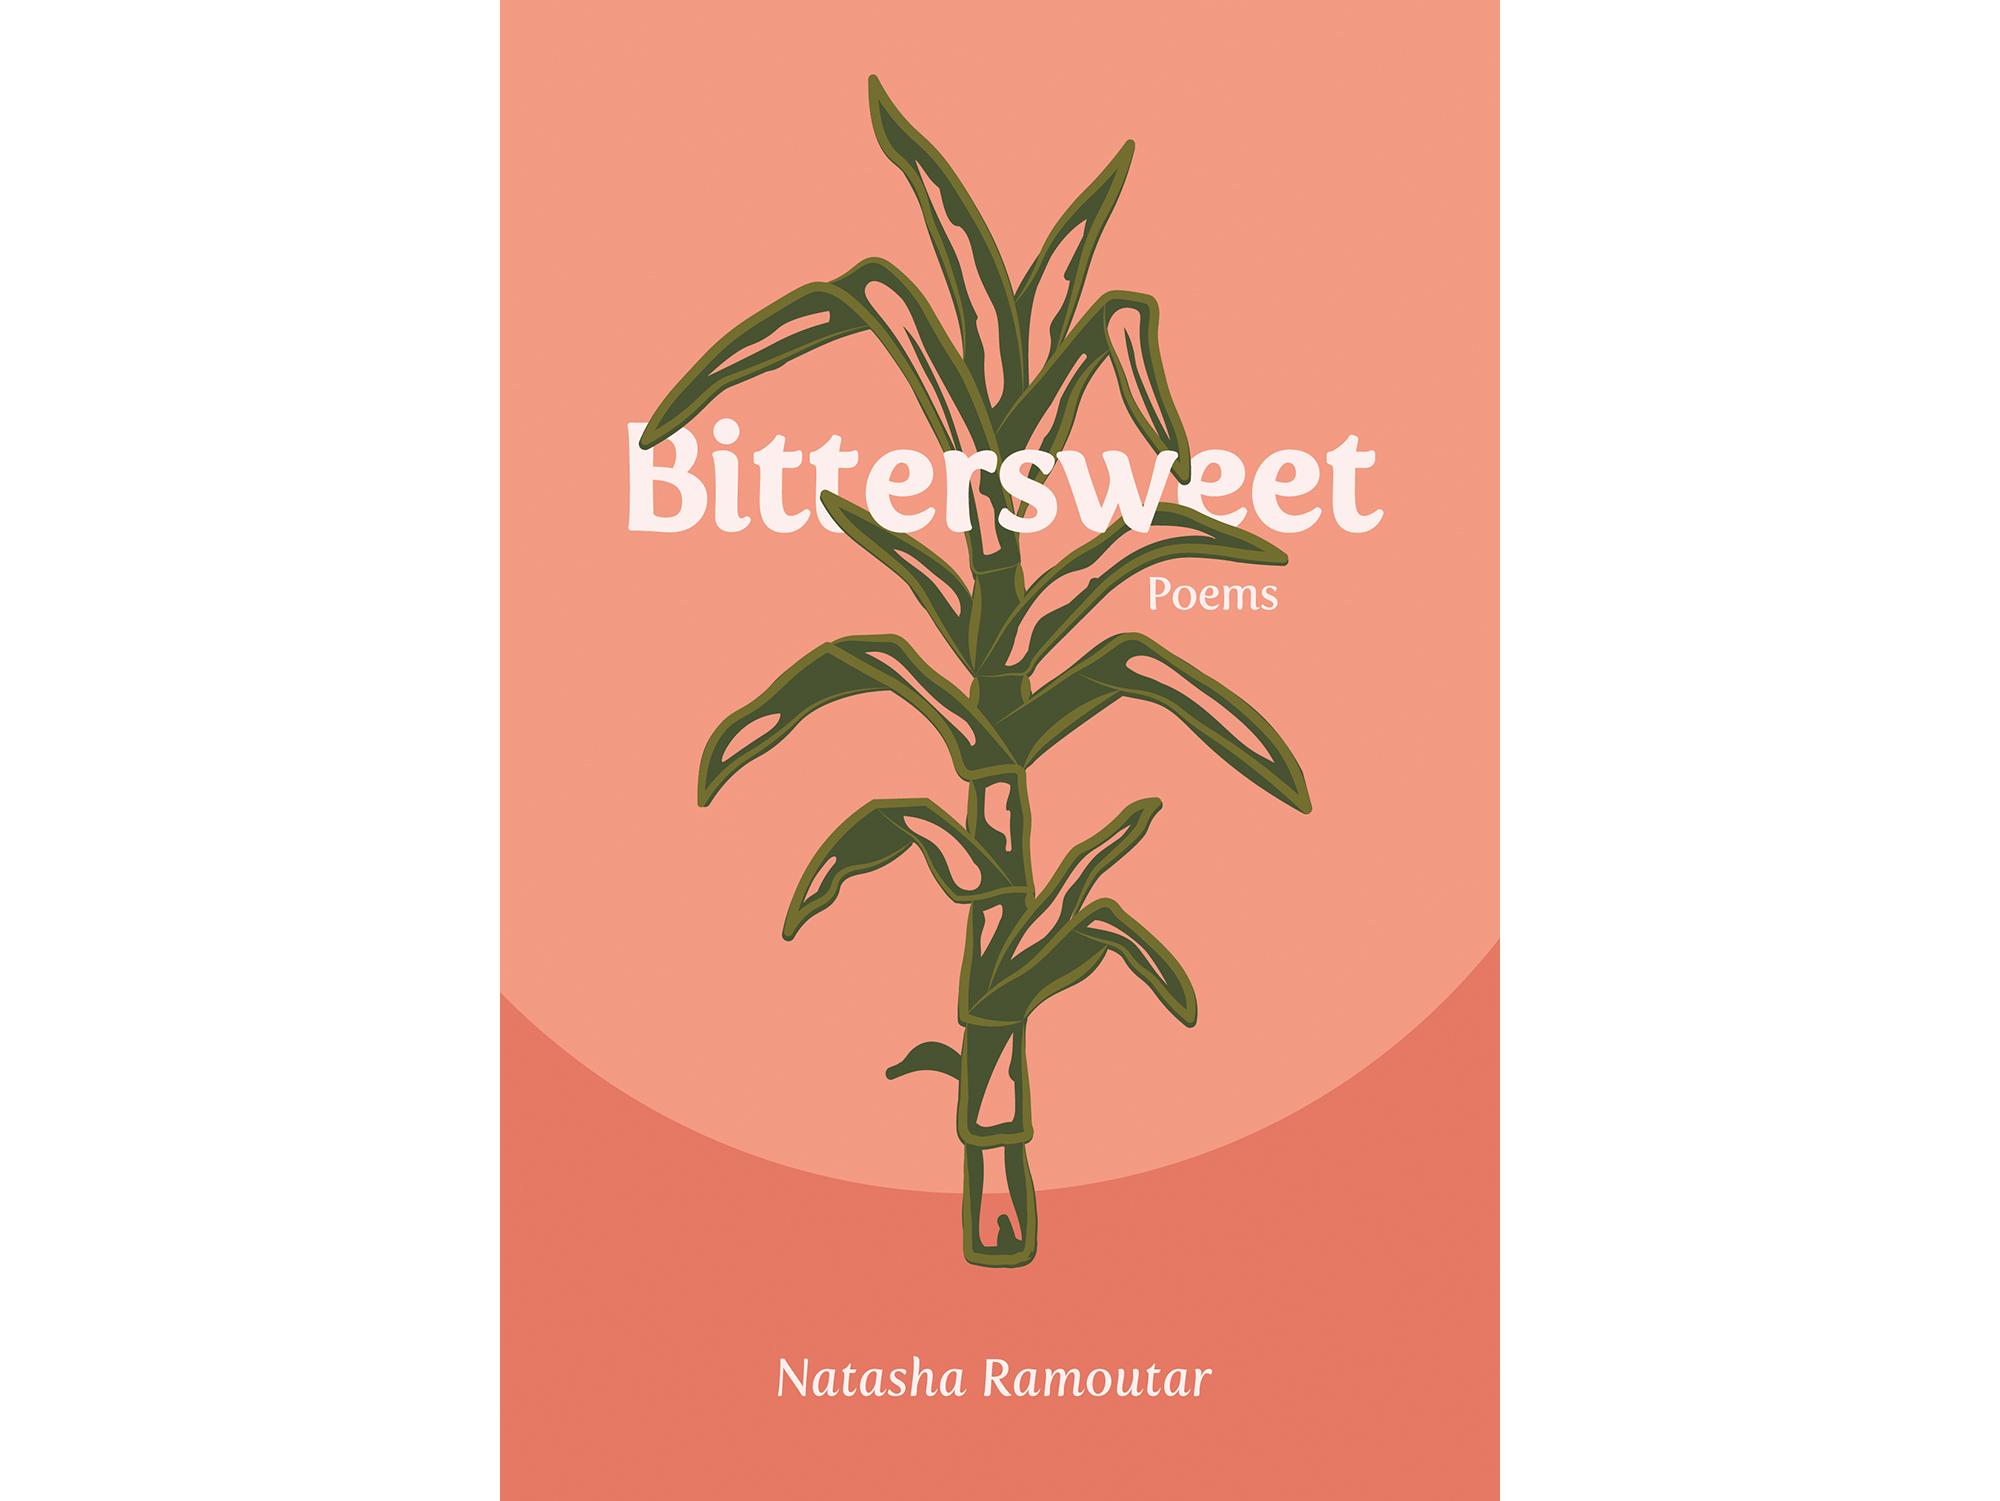 Cover of Natasha Ramoutar's Bittersweet